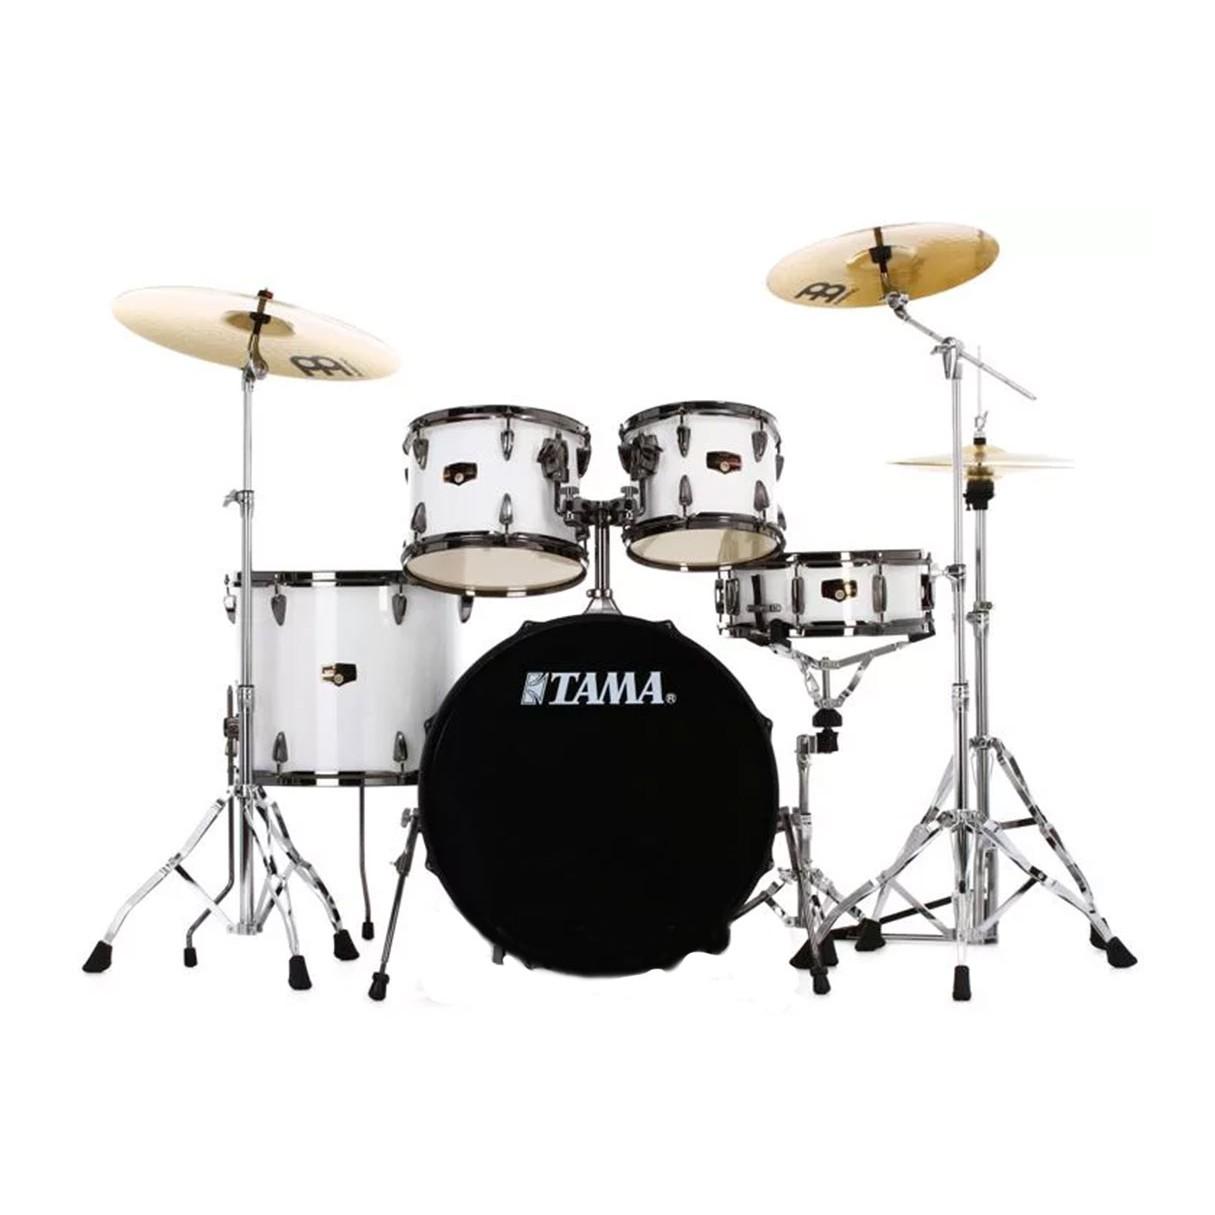 tama imperialstar 5 piece complete drum kit sugar white. Black Bedroom Furniture Sets. Home Design Ideas